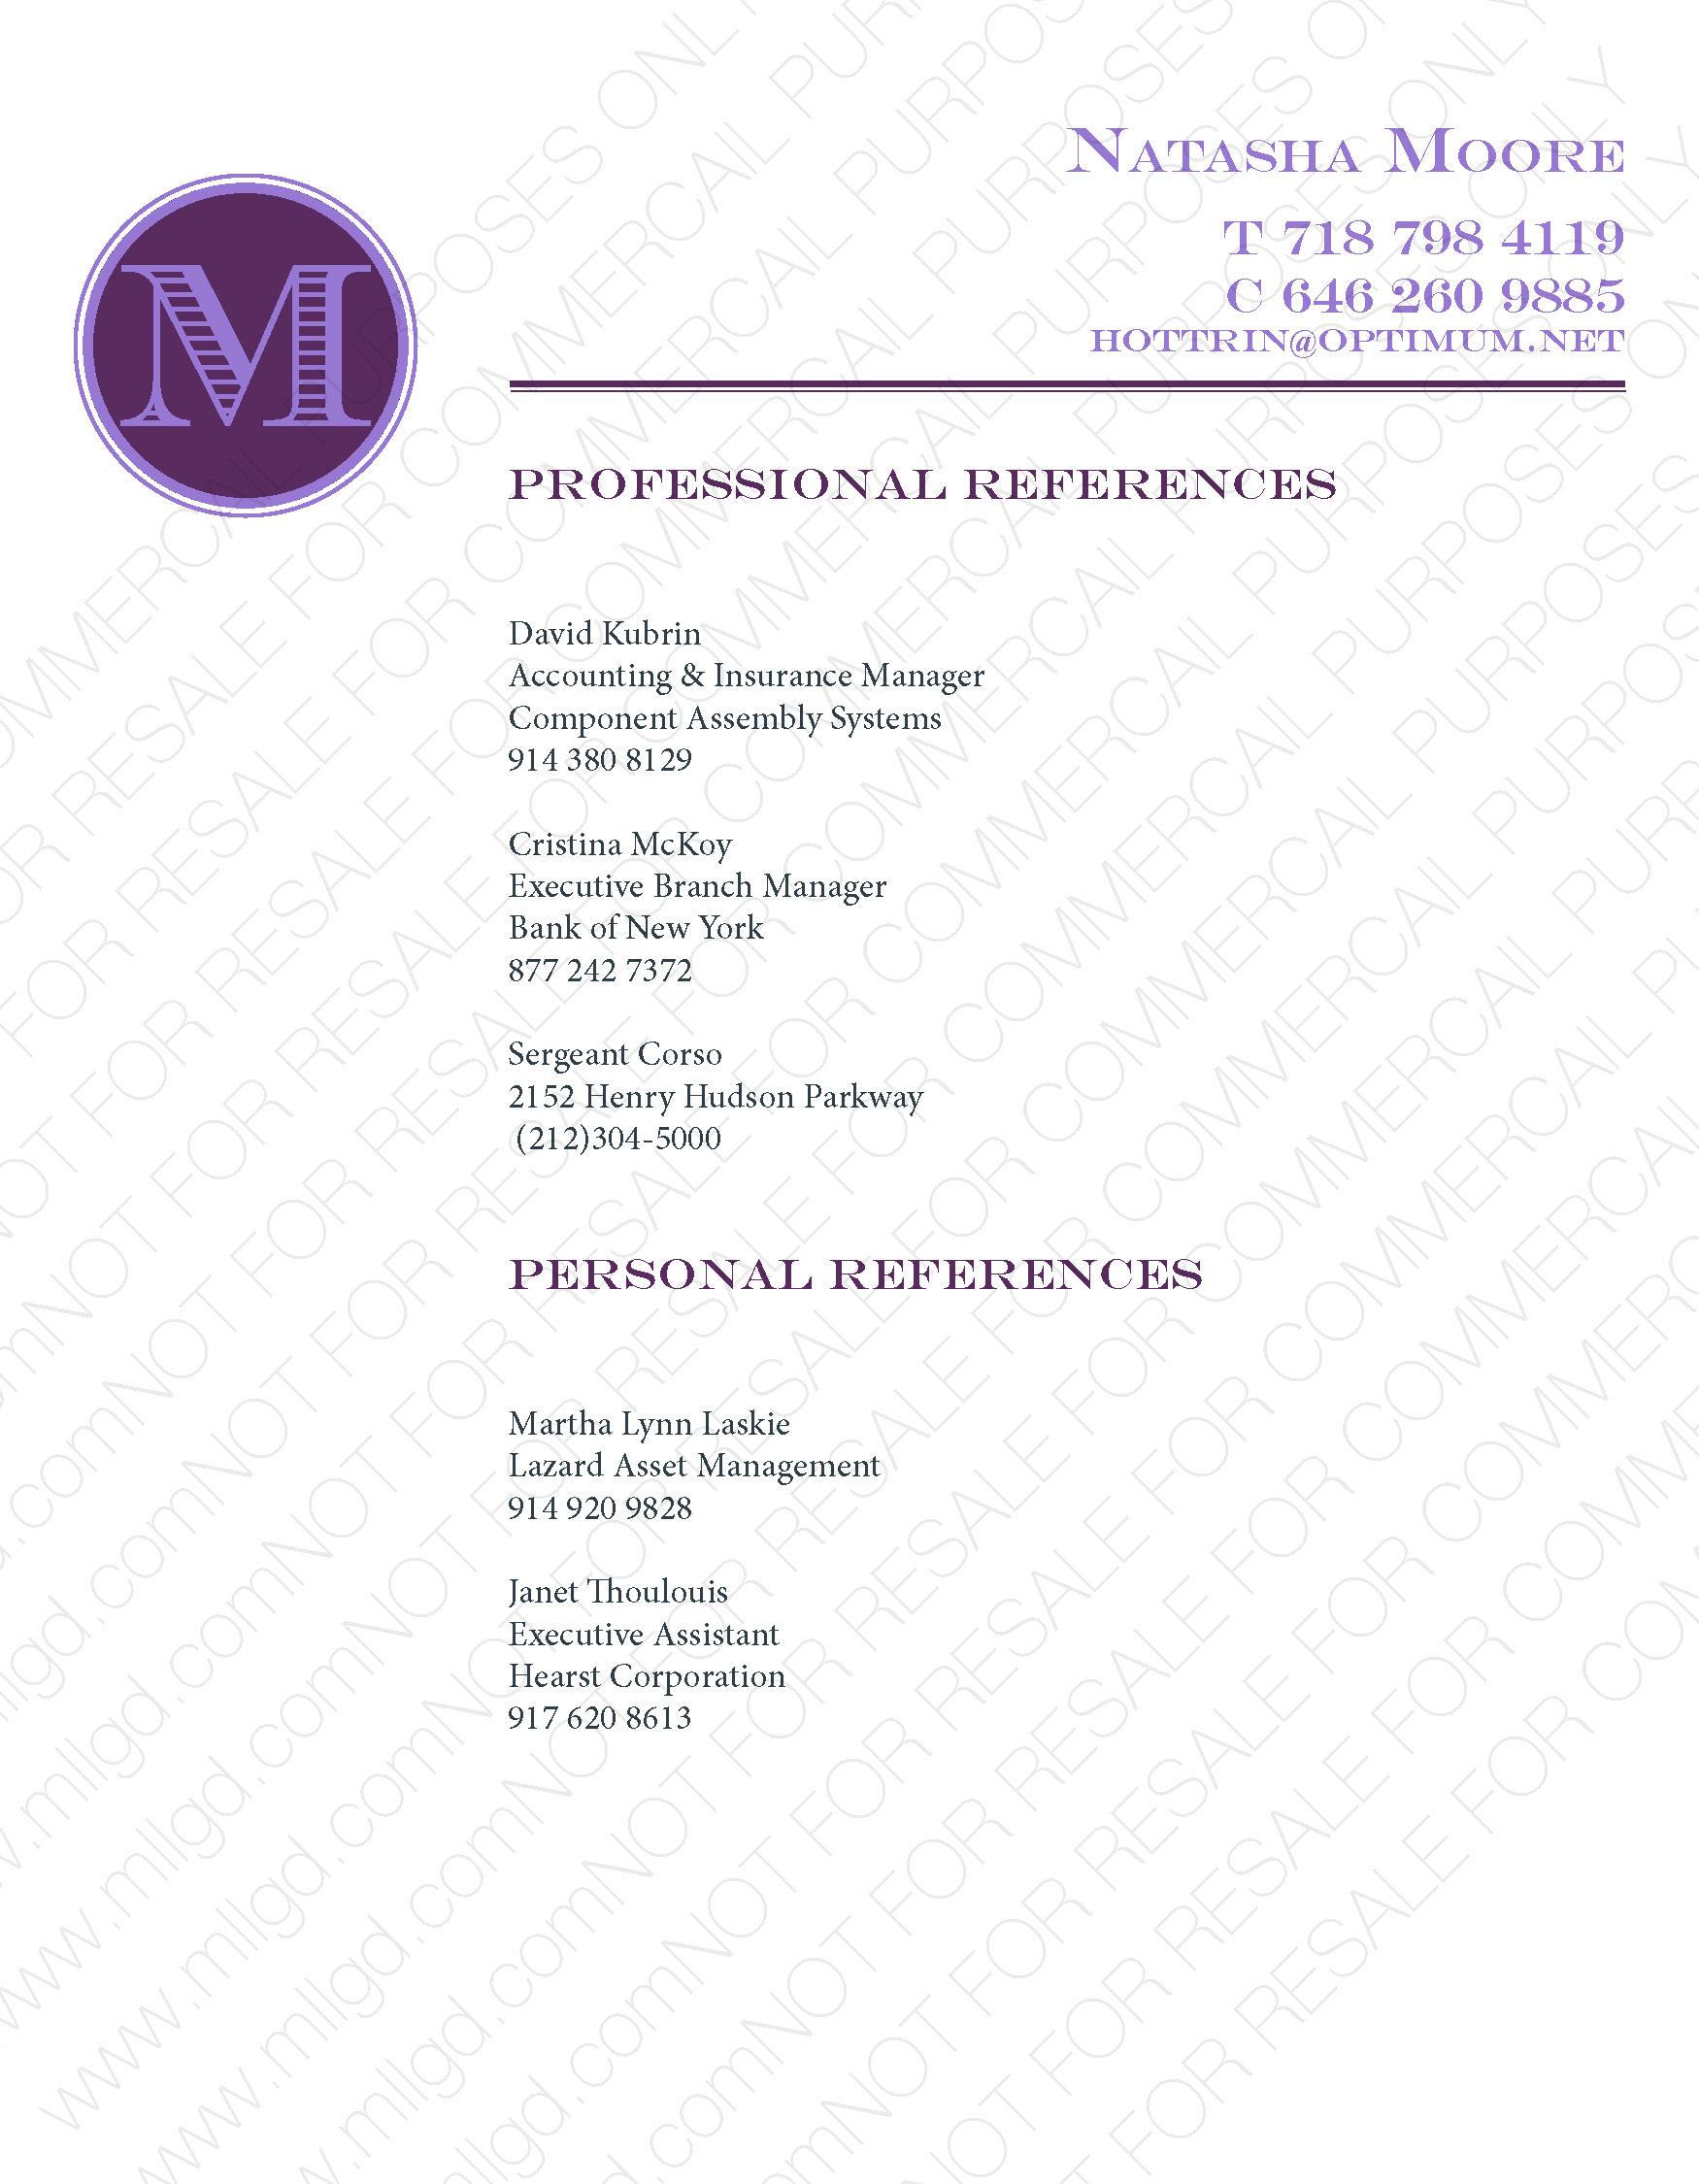 MLL_Resume_Design_2014_Page_16.jpg